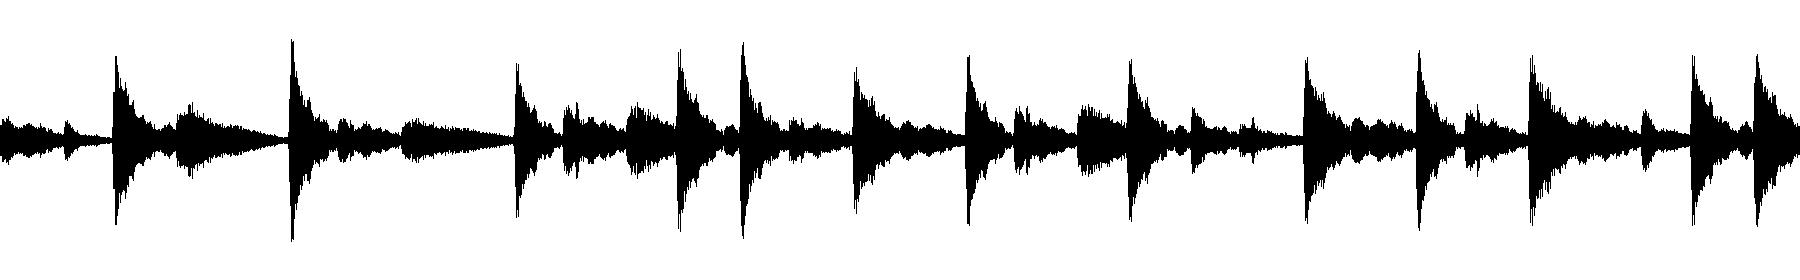 g abs05 063